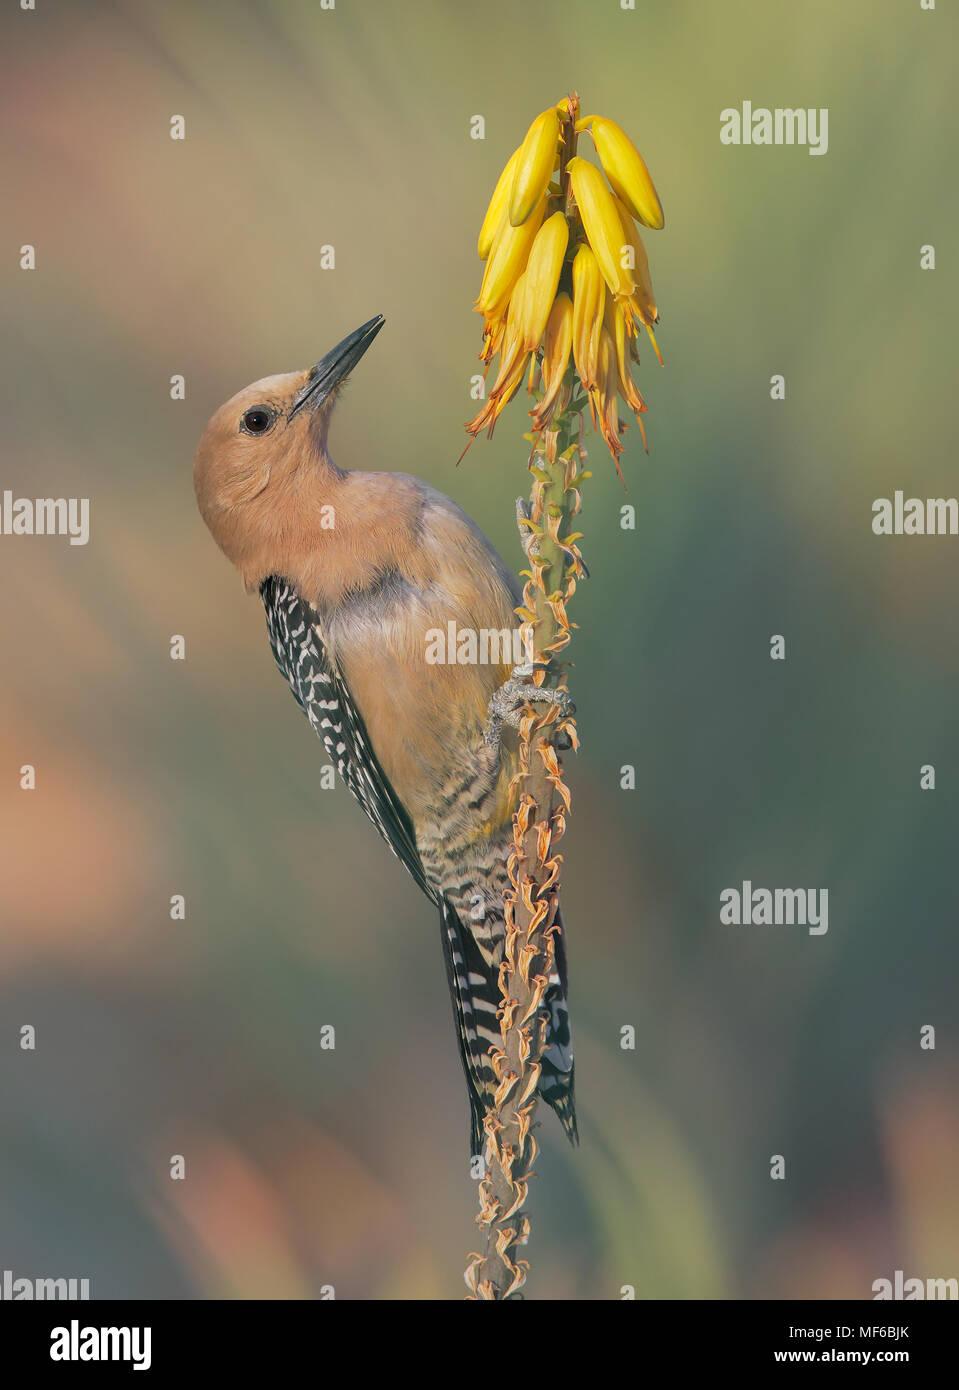 Gila Woodpecker Imagen De Stock